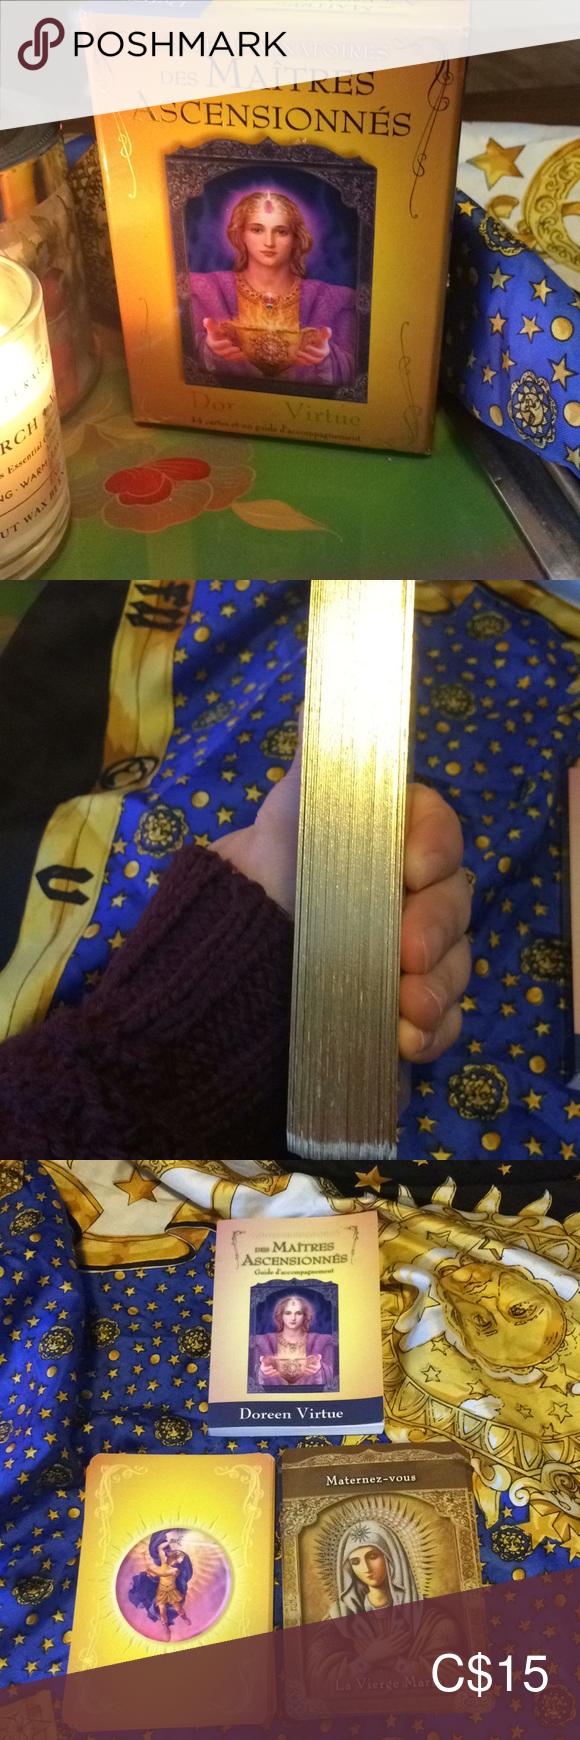 Cartes divinatoires des MaîtresAscensionnes Doreen